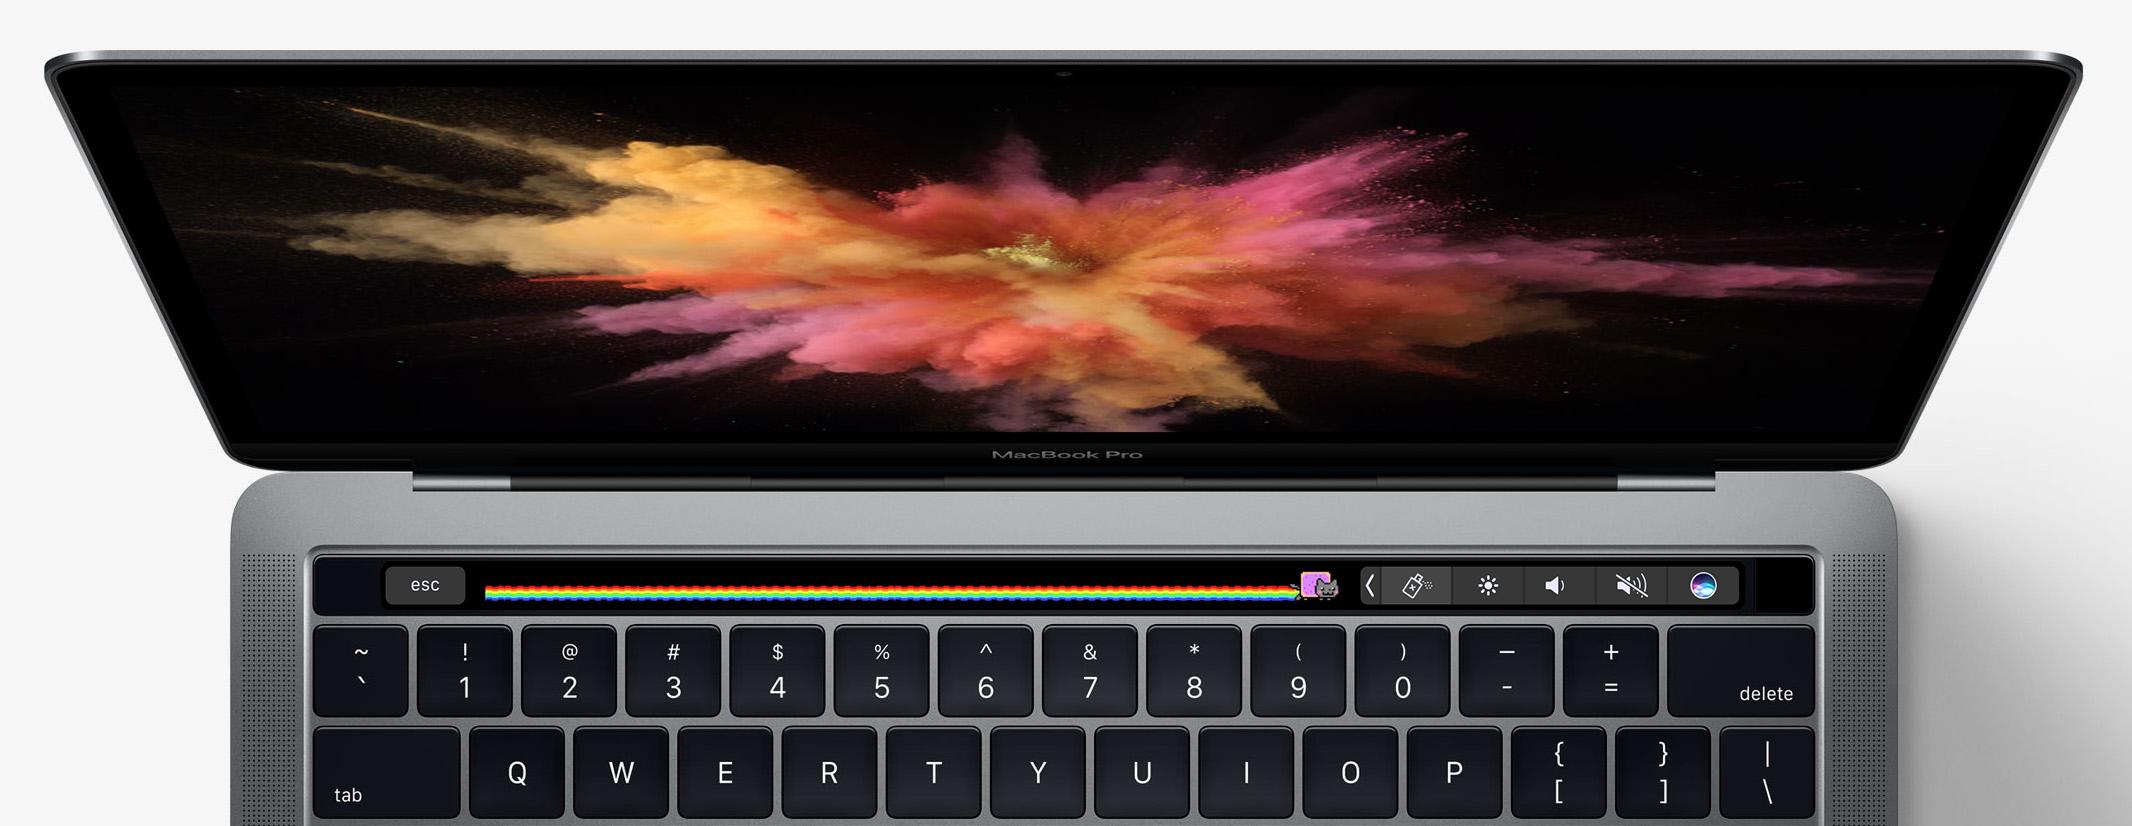 New MacBook Pro Touchbar justified